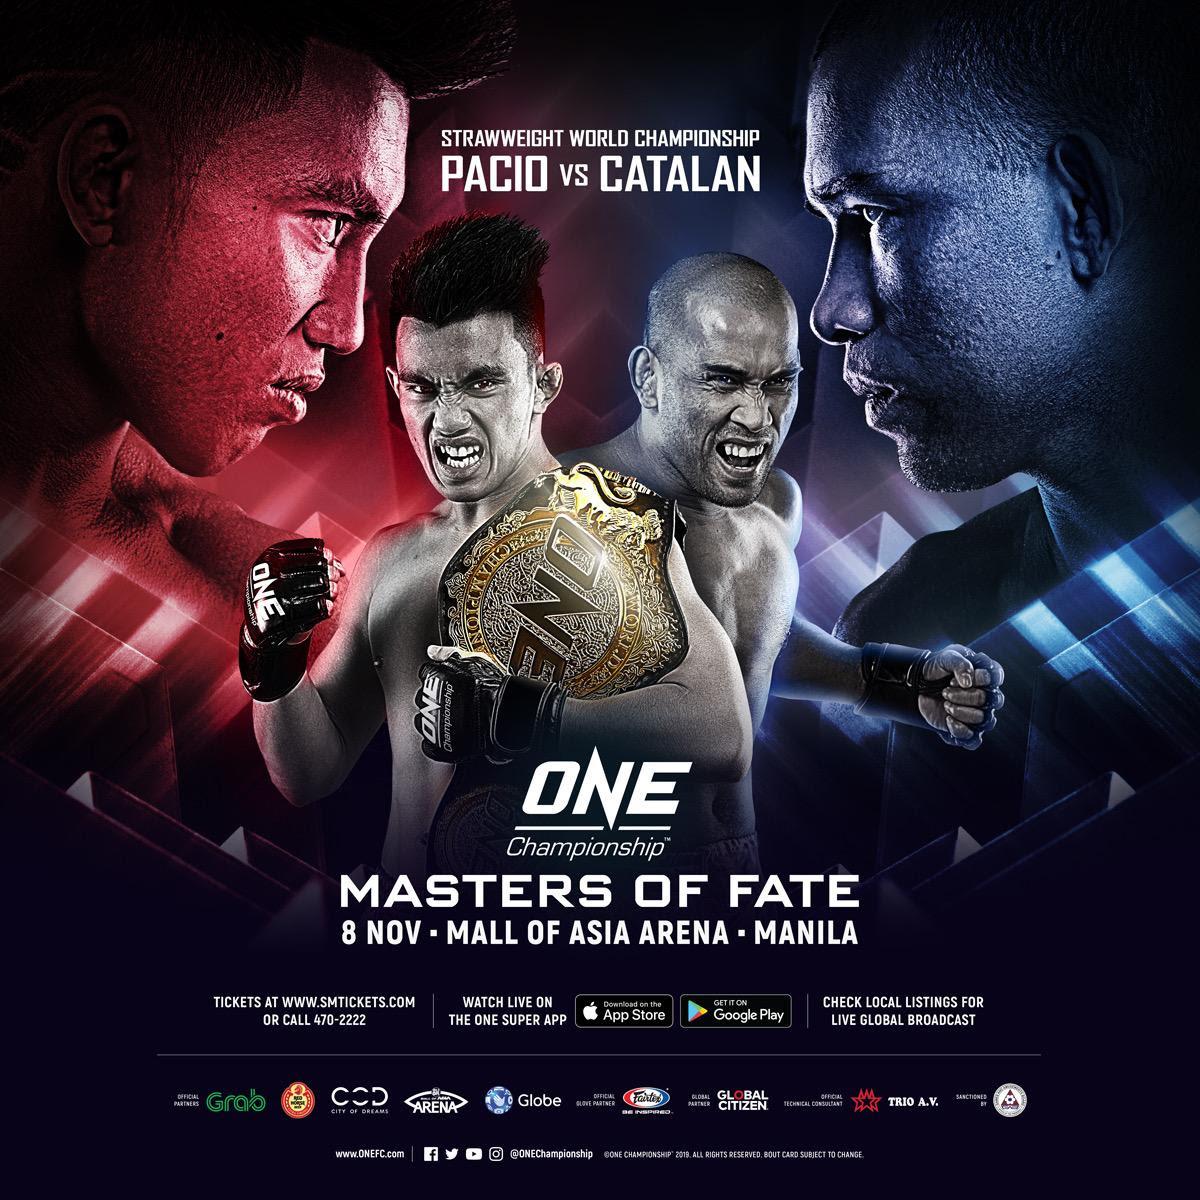 JOSHUA PACIO TO DEFEND ONE STRAWWEIGHT WORLD CHAMPIONSHIP AGAINST RENE CATALAN - ONE Championship